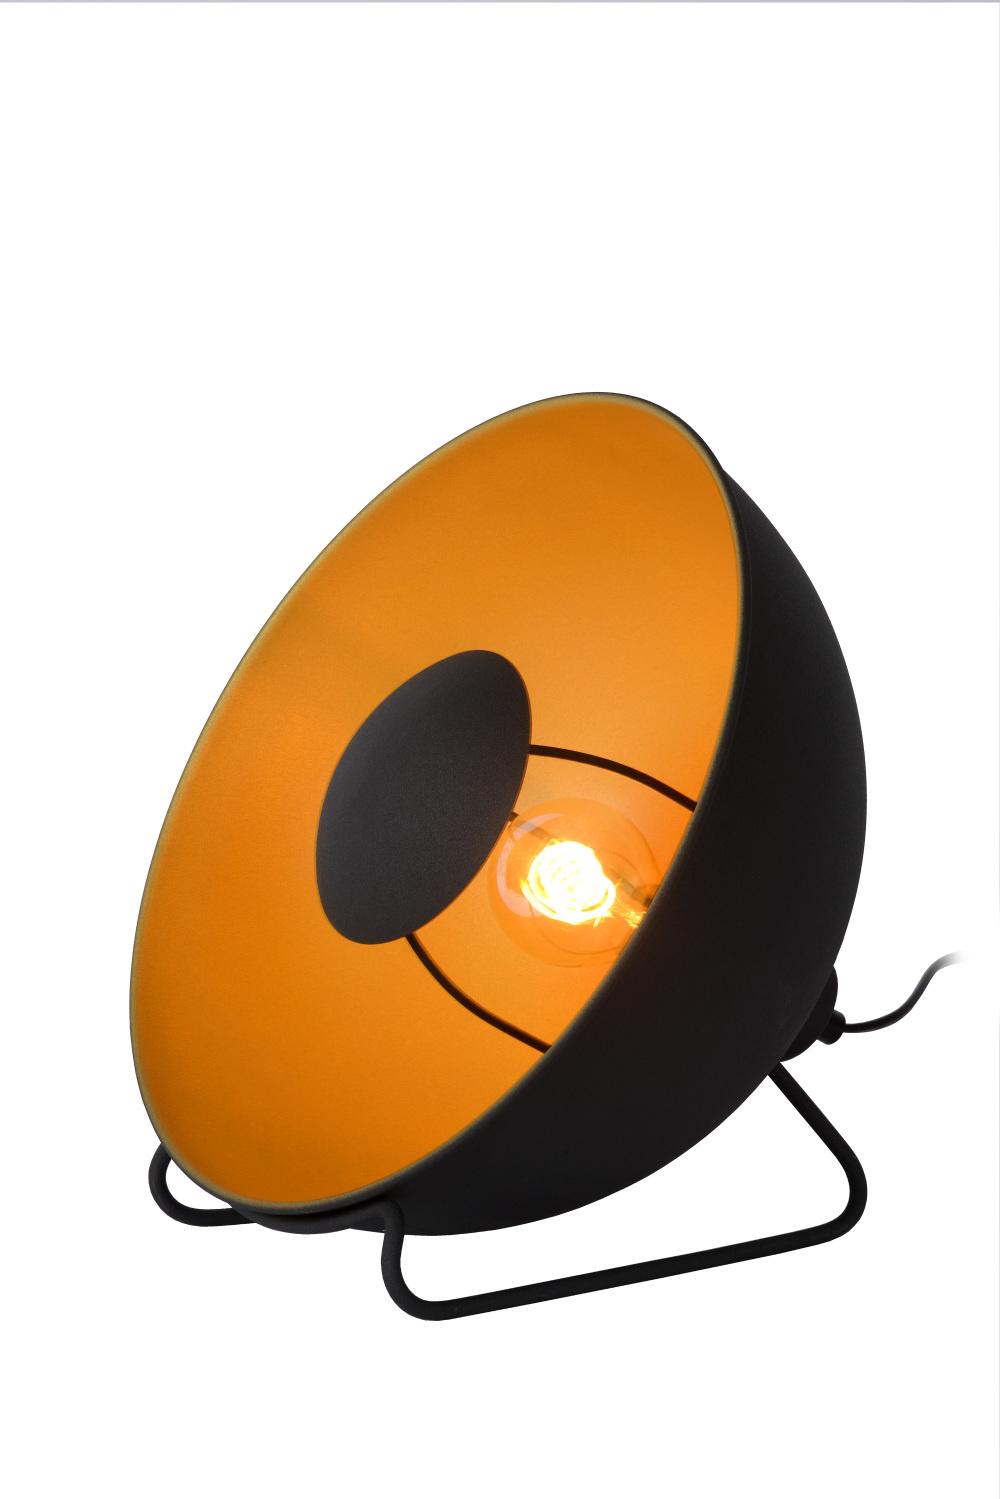 Lucide ALVARO Tafellamp E27/40W Ø 31cm Zwart/mat goud